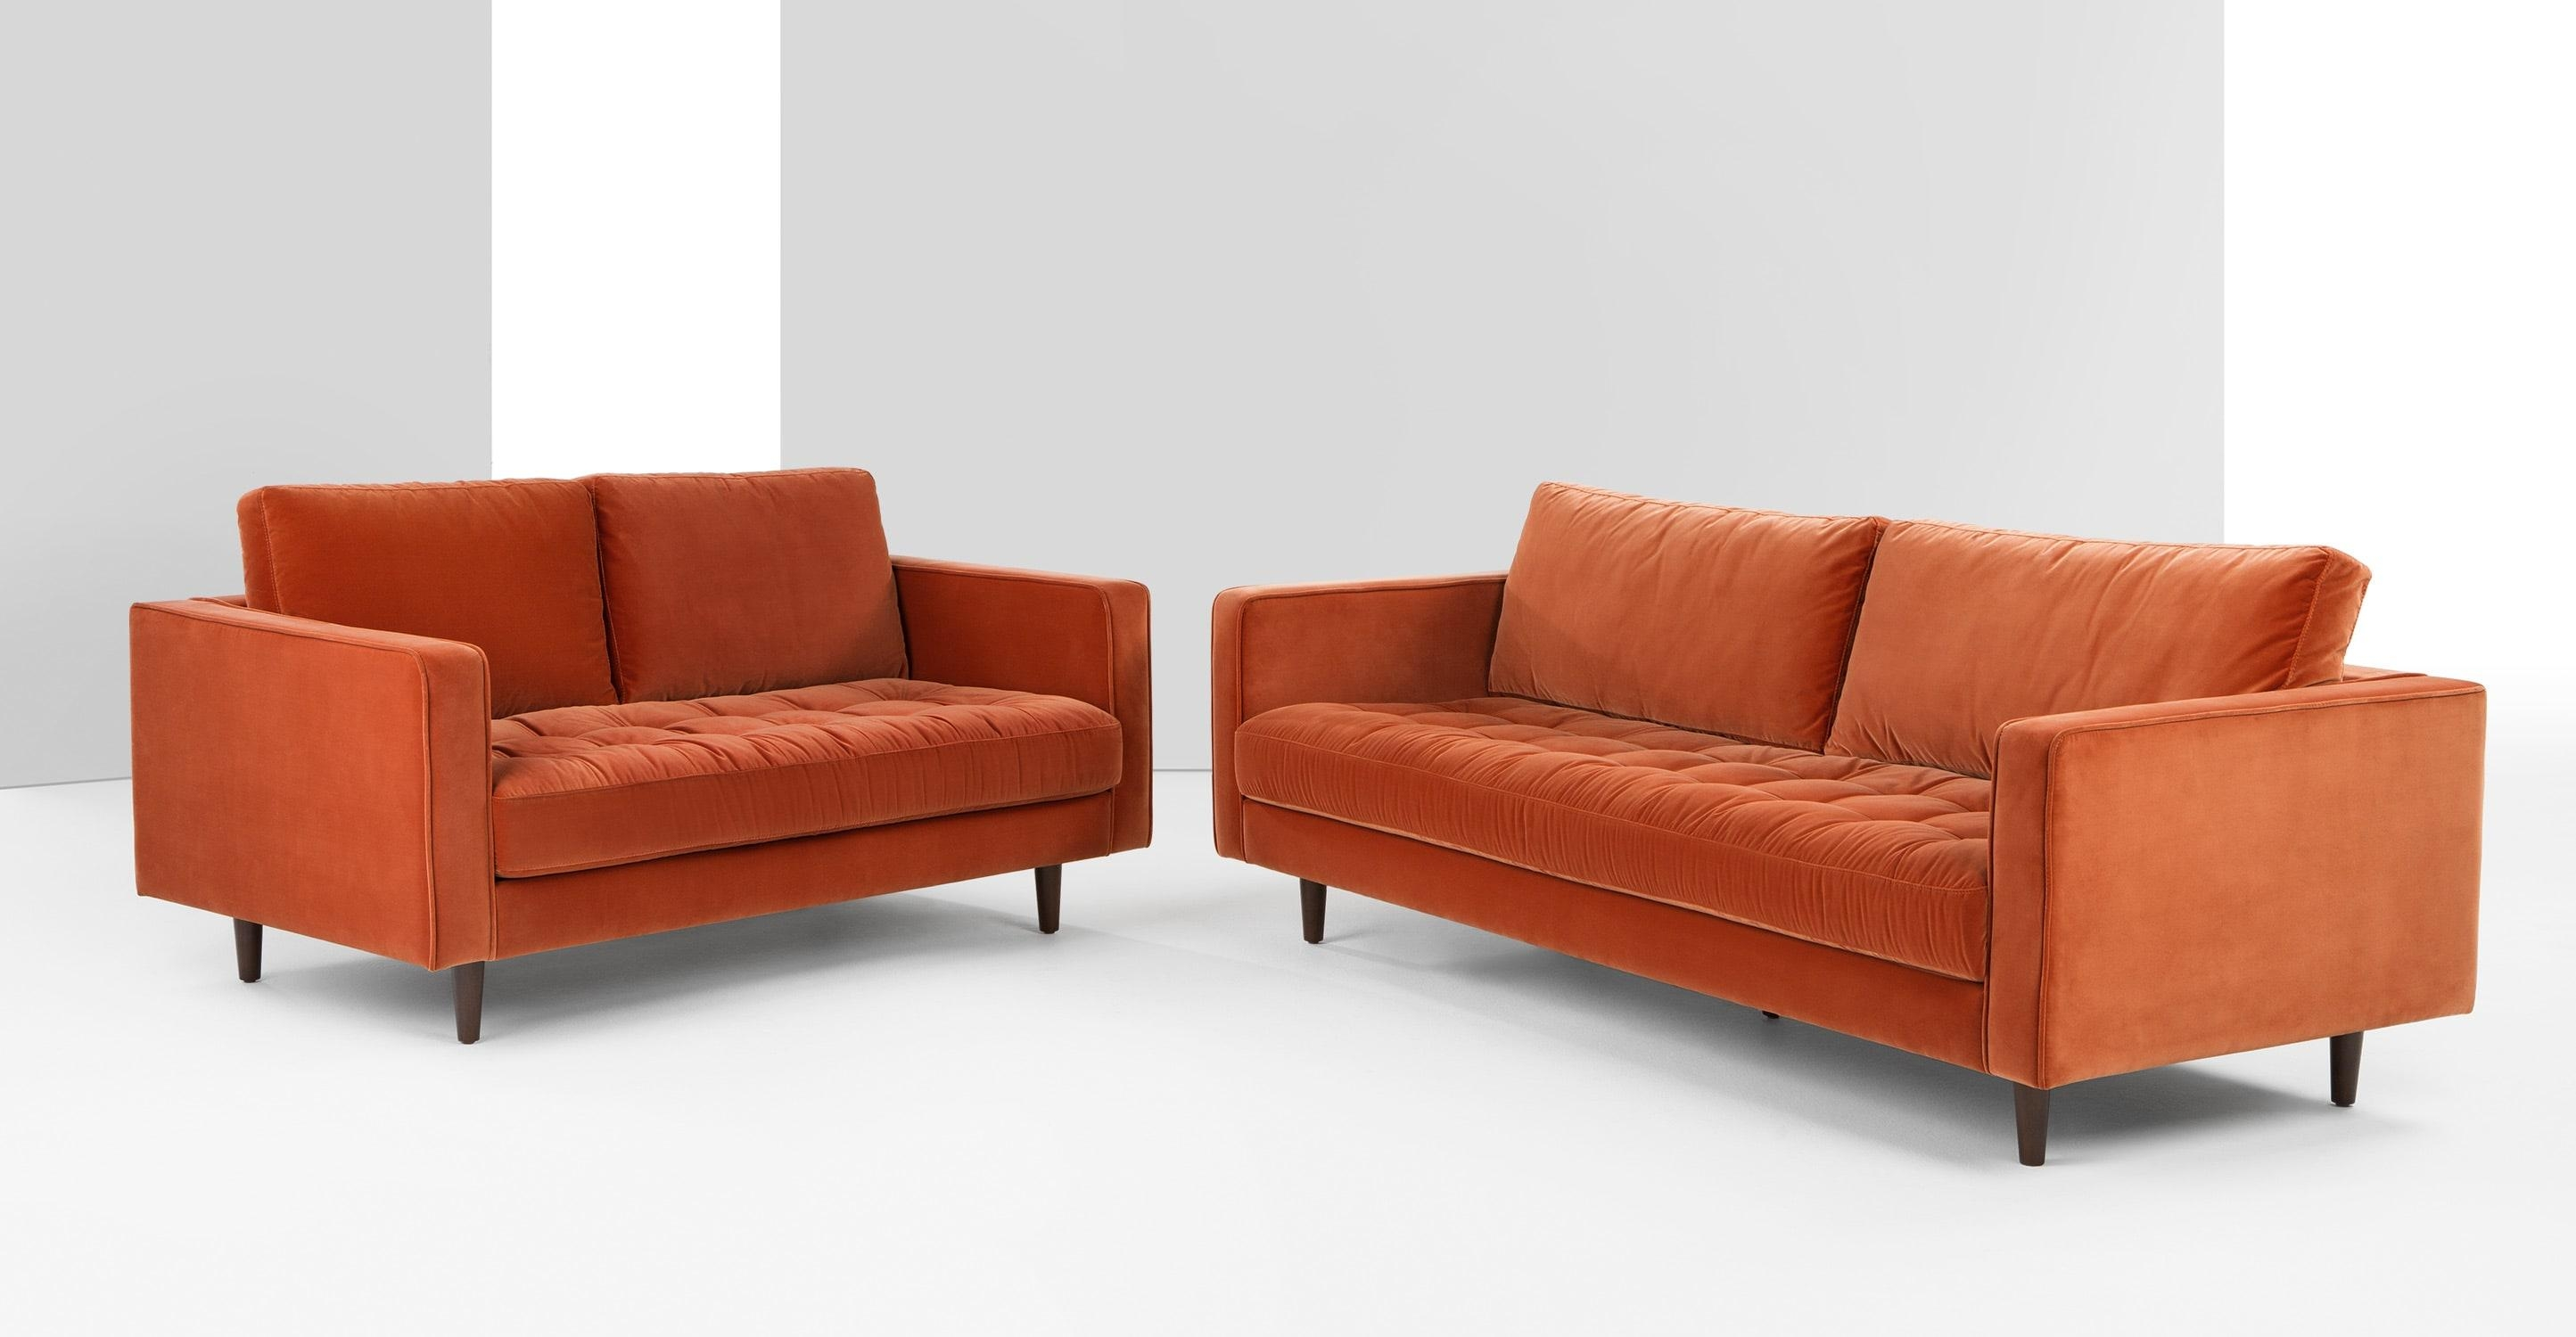 Scott Armchair, Burnt Orange Cotton Velvet | Made Regarding Burnt Orange Sofas (View 17 of 20)